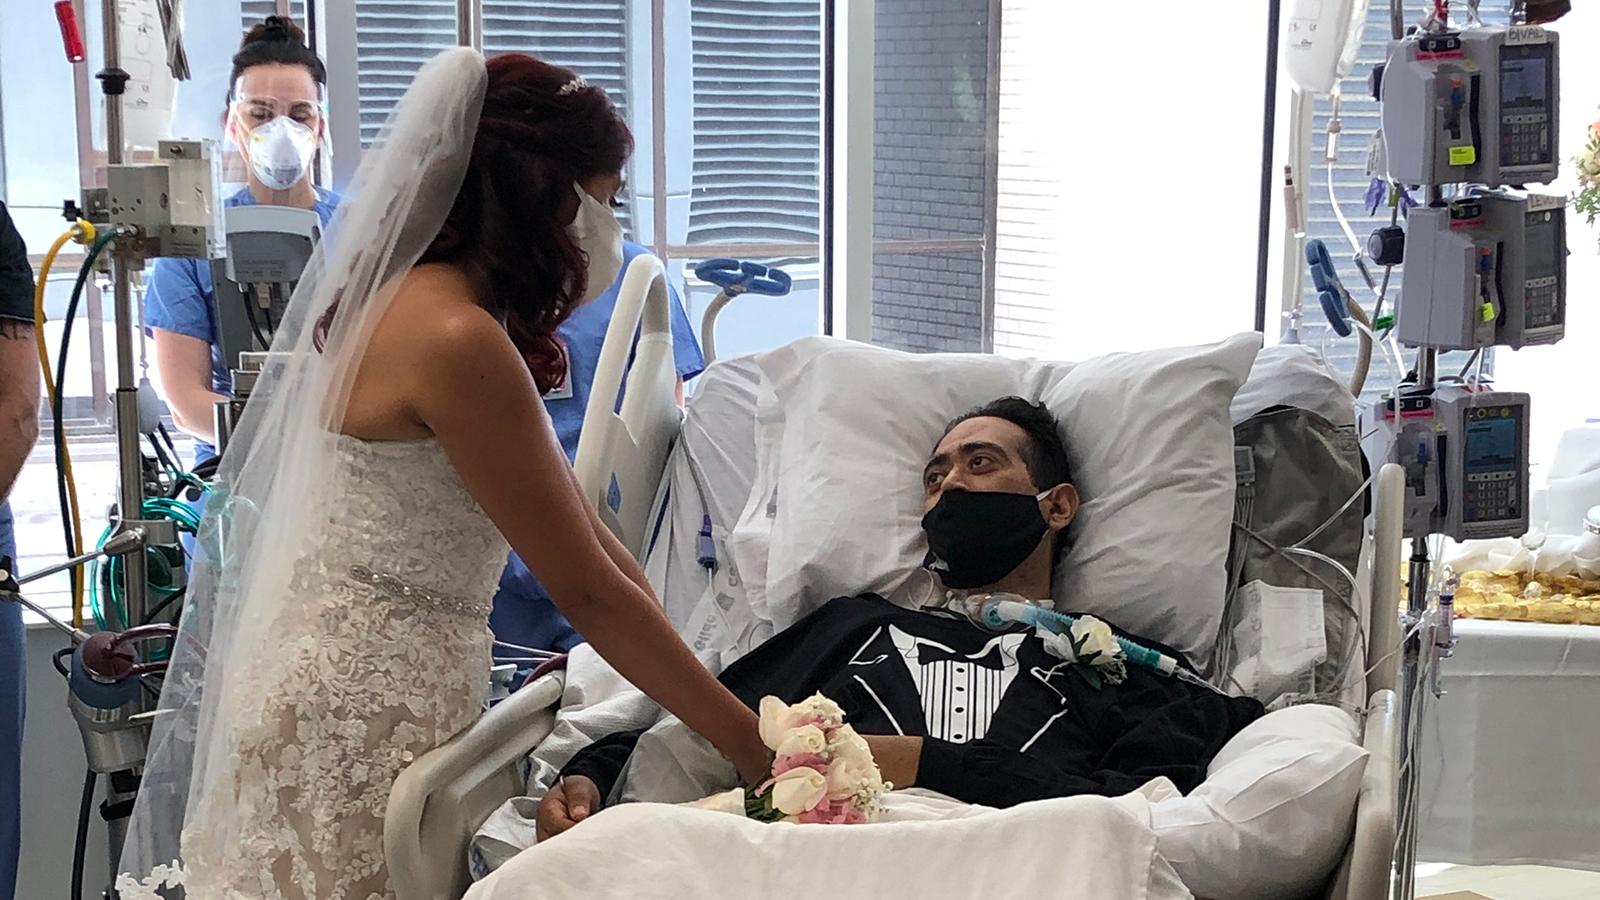 Nurses at Texas Hospital Organize Coronavirus Patient's Wedding To Help Lift His Spirits